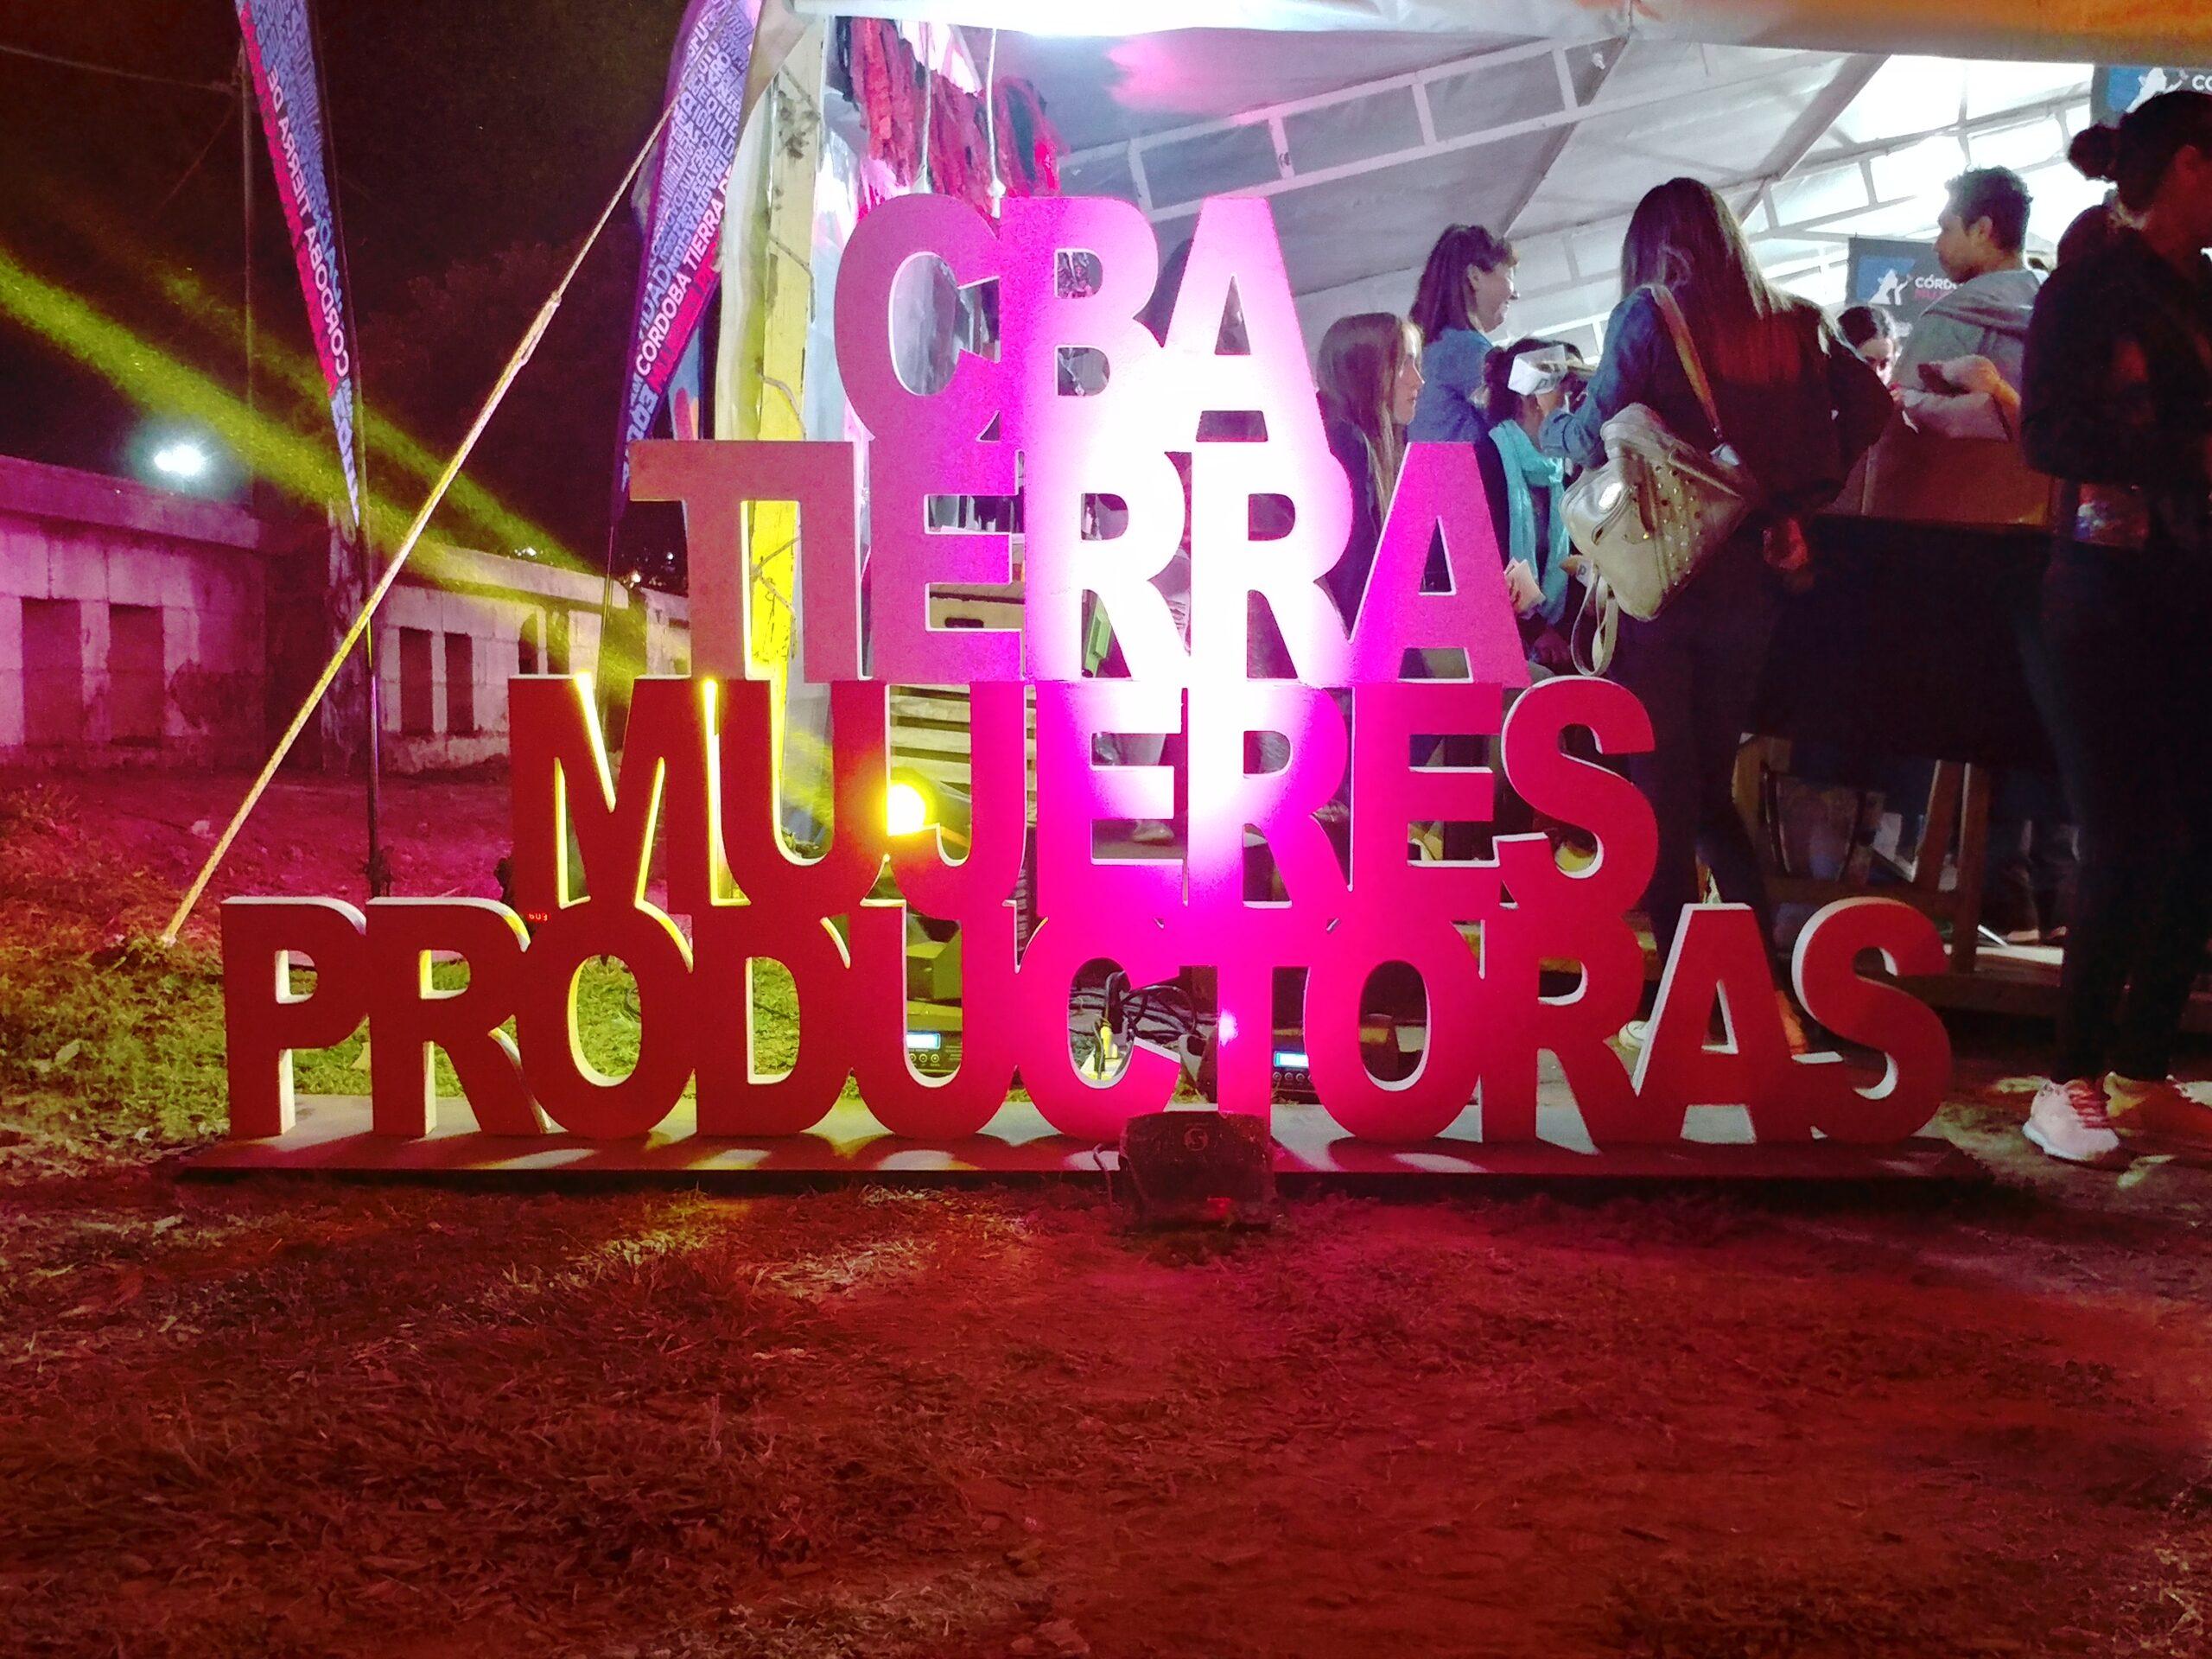 Mujeres productoras